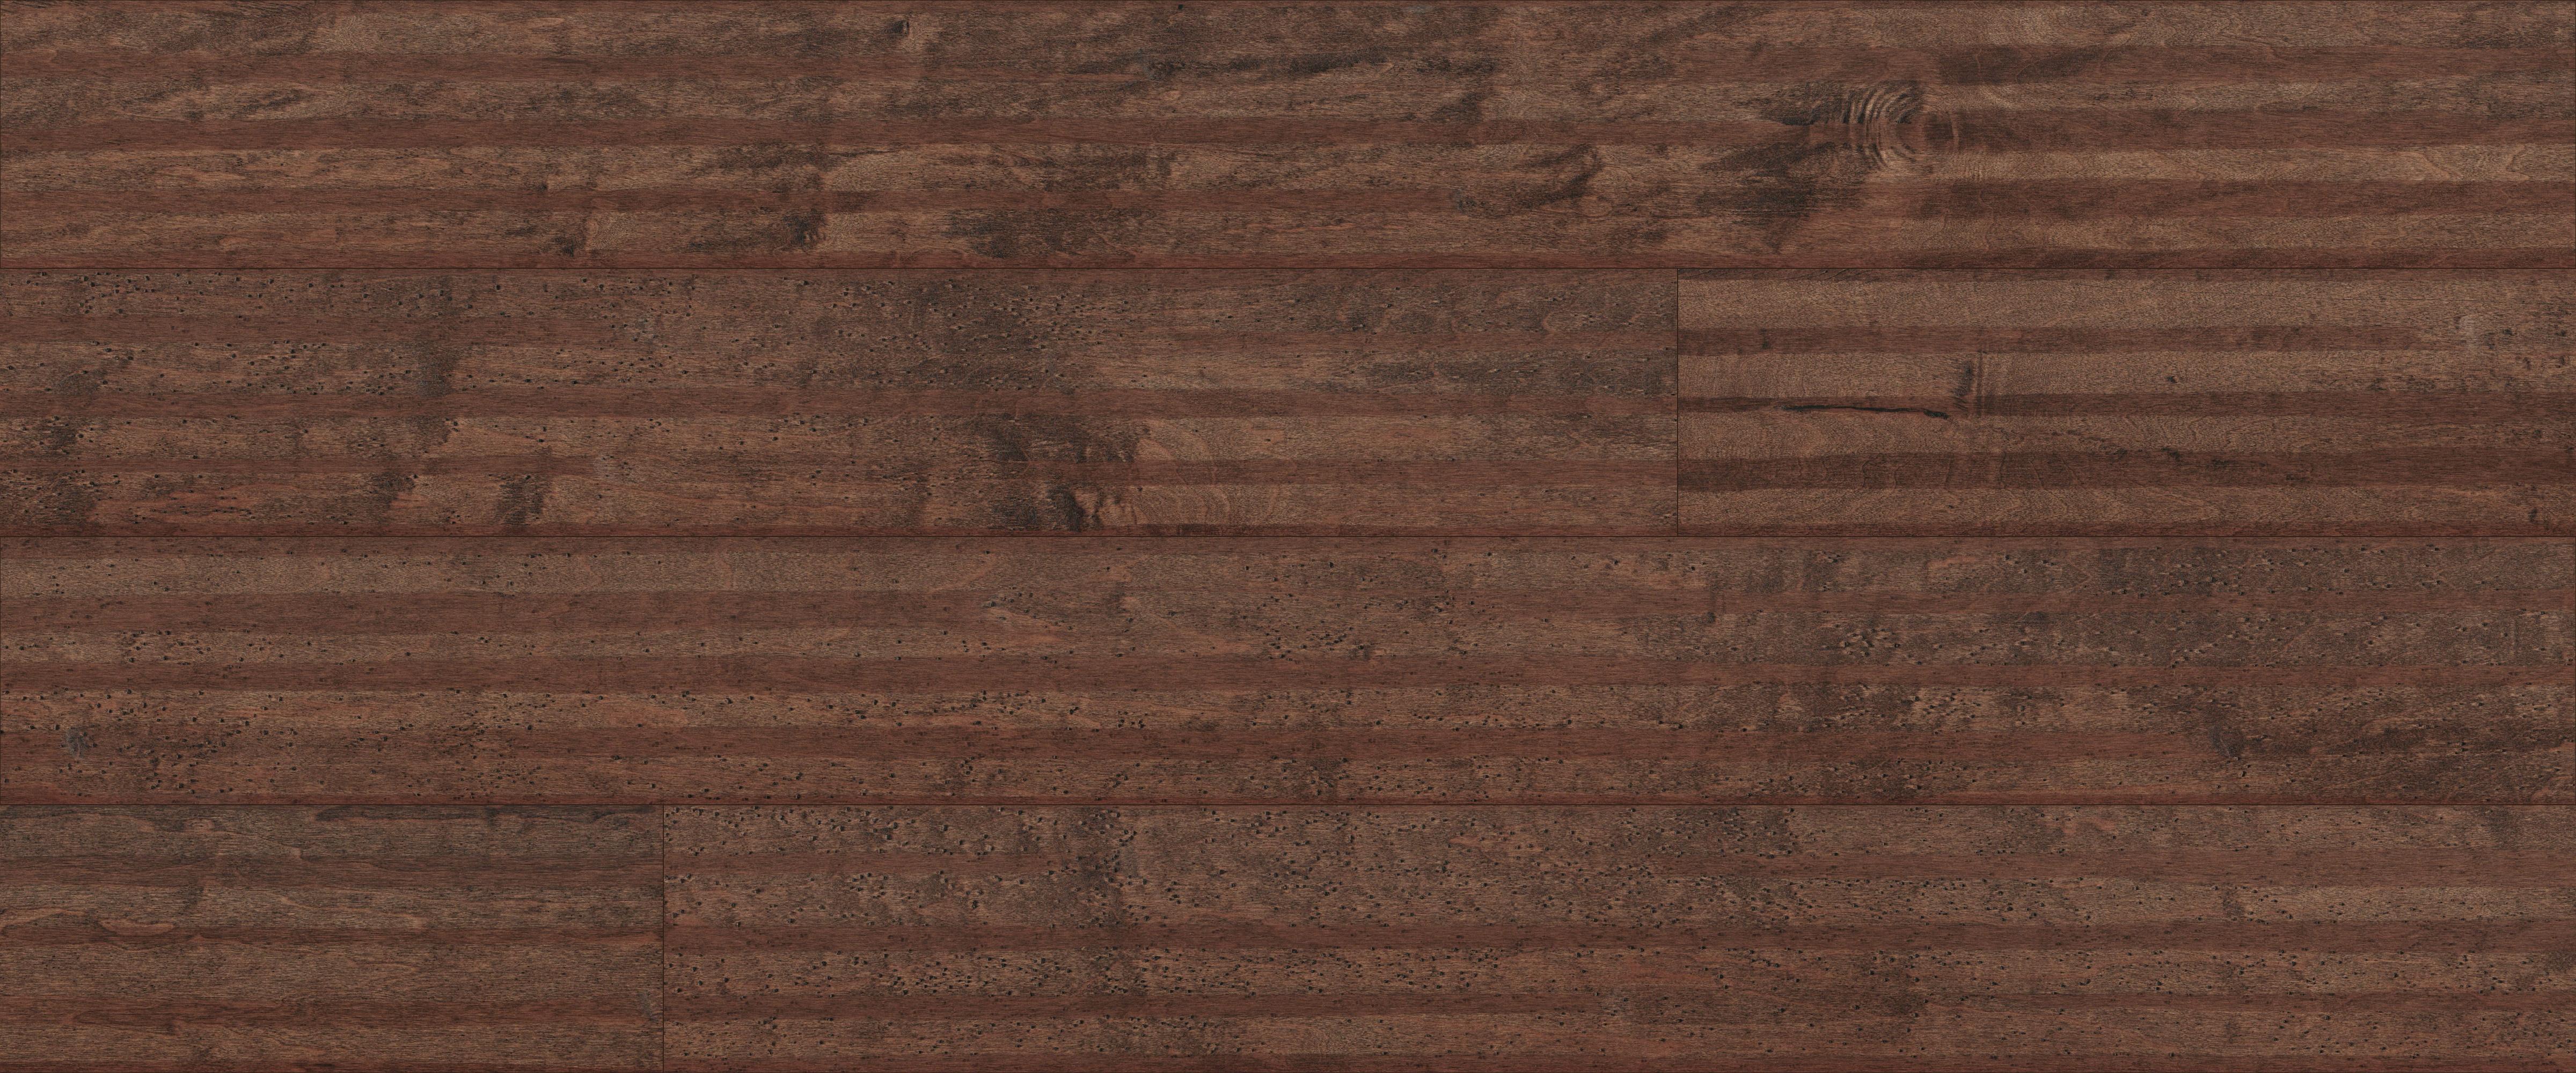 bruce click lock hardwood flooring of mullican lincolnshire sculpted maple autumn 5 engineered hardwood with regard to mullican lincolnshire sculpted maple autumn 5 engineered hardwood flooring